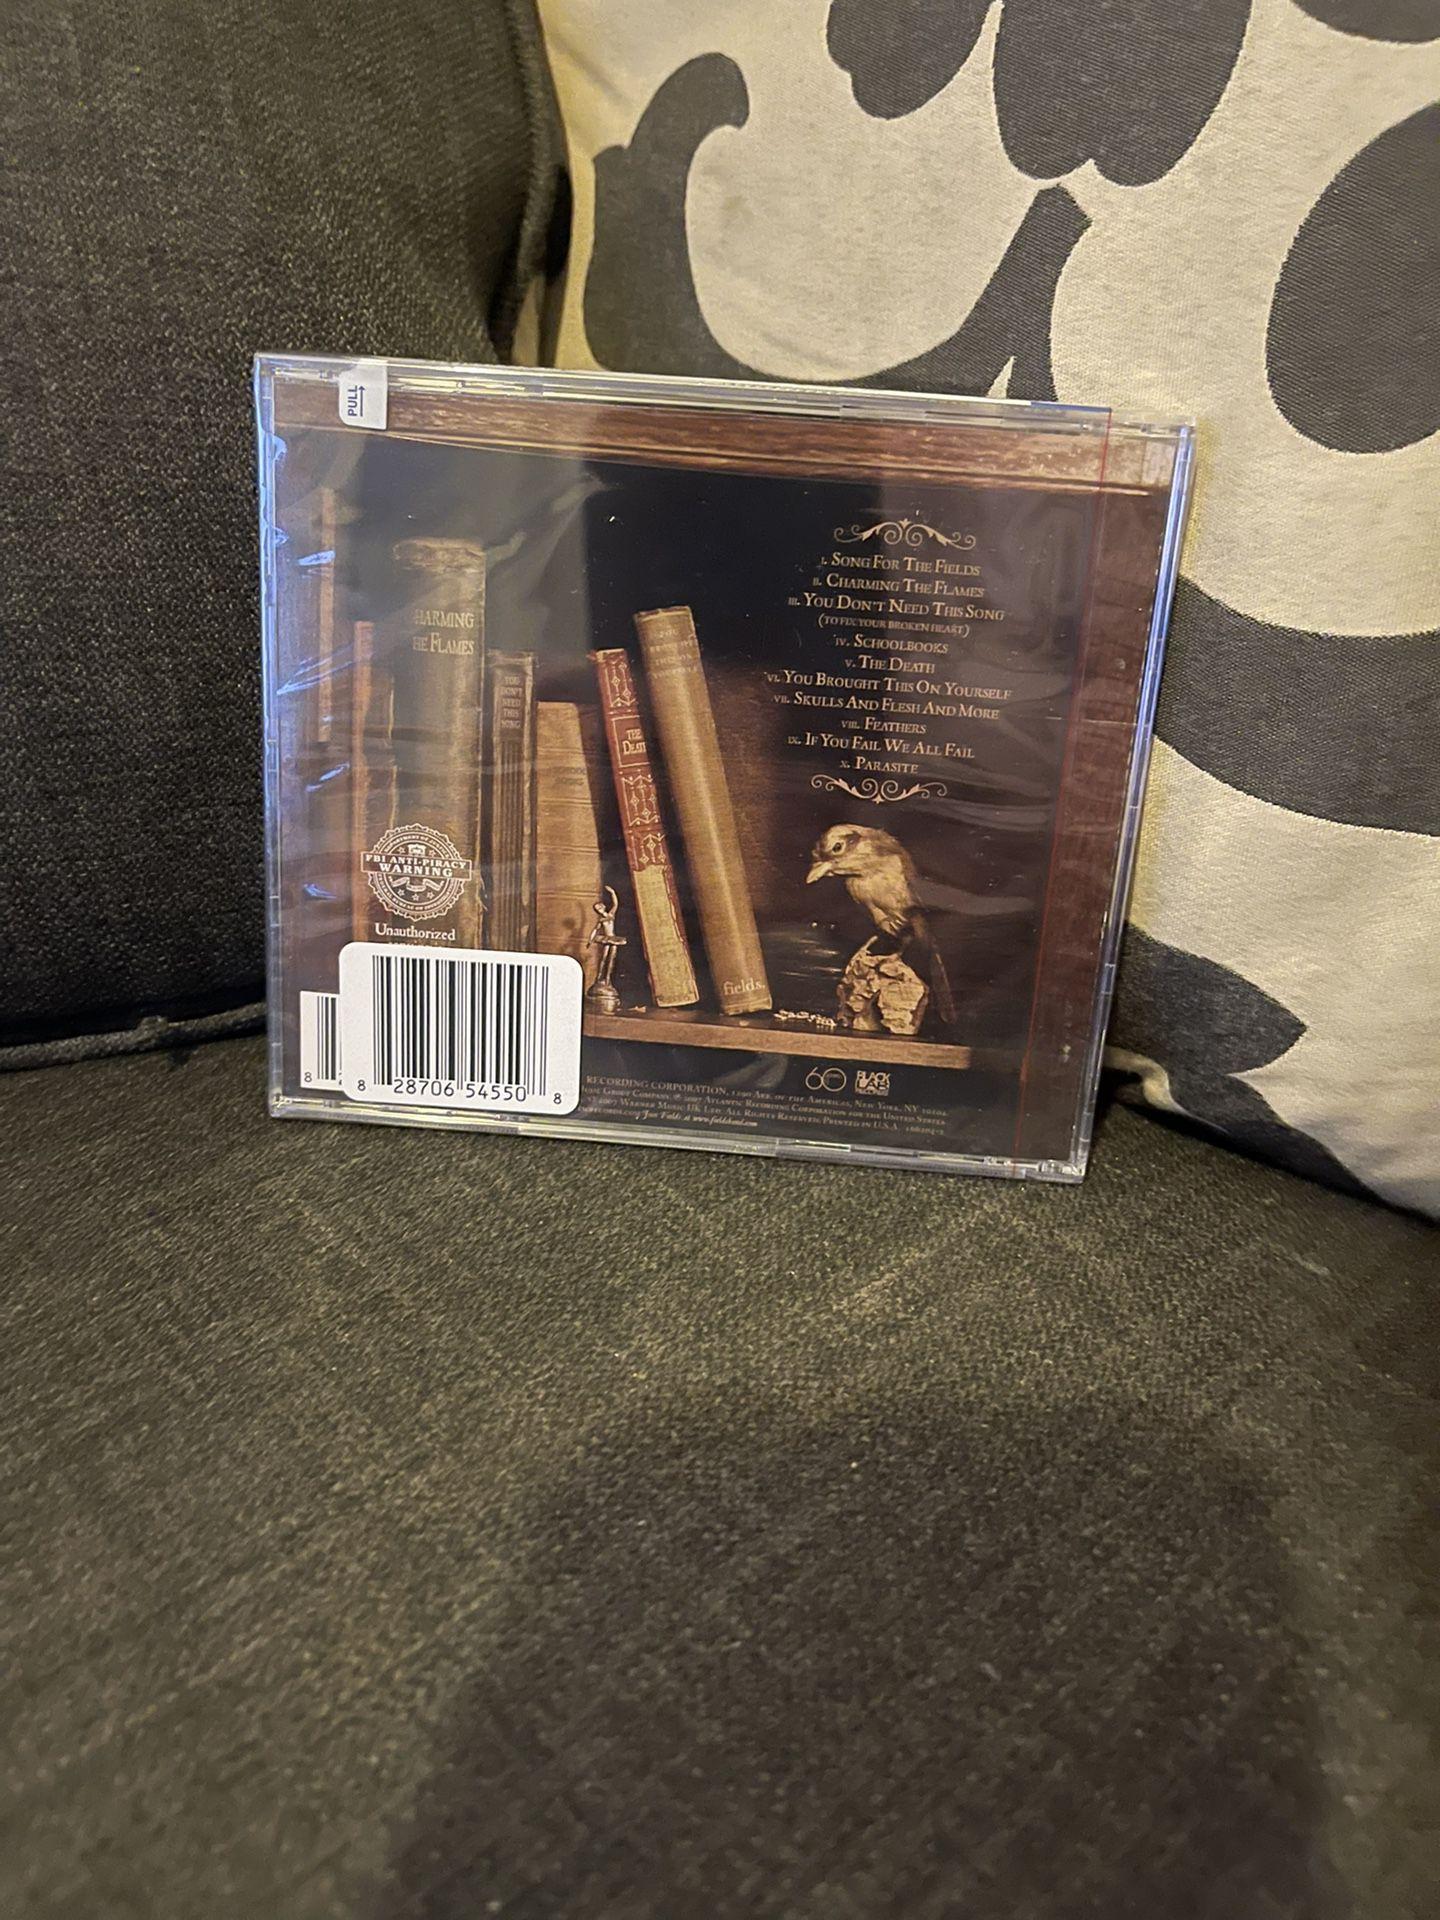 FIELDS - Everything Last Winter CD